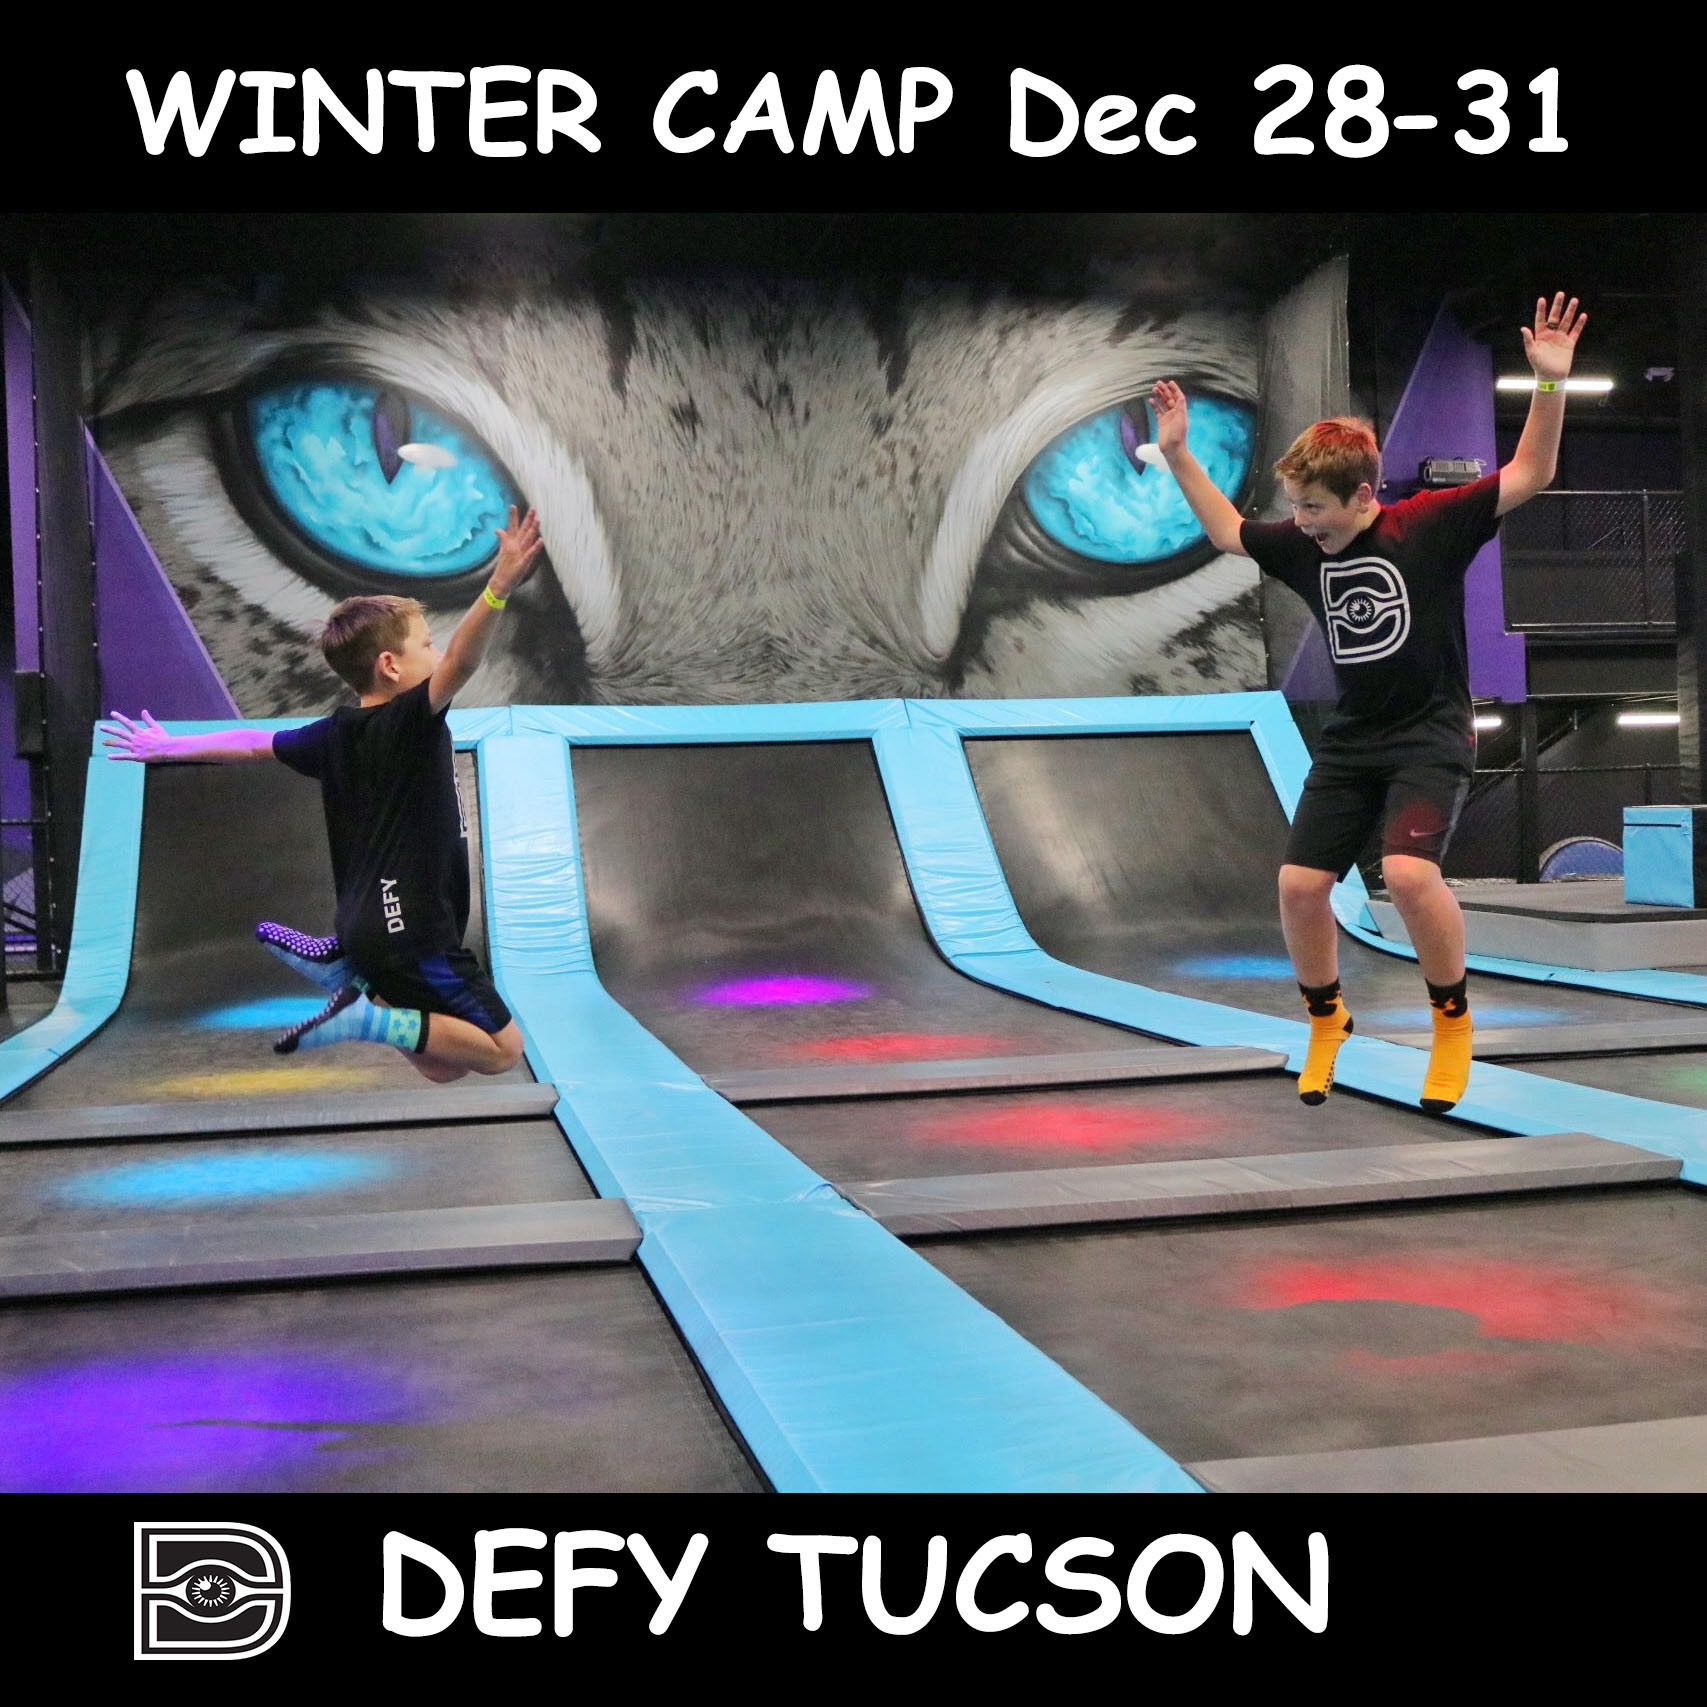 Winter Camp 2 jumpers sq 28-31.jpg